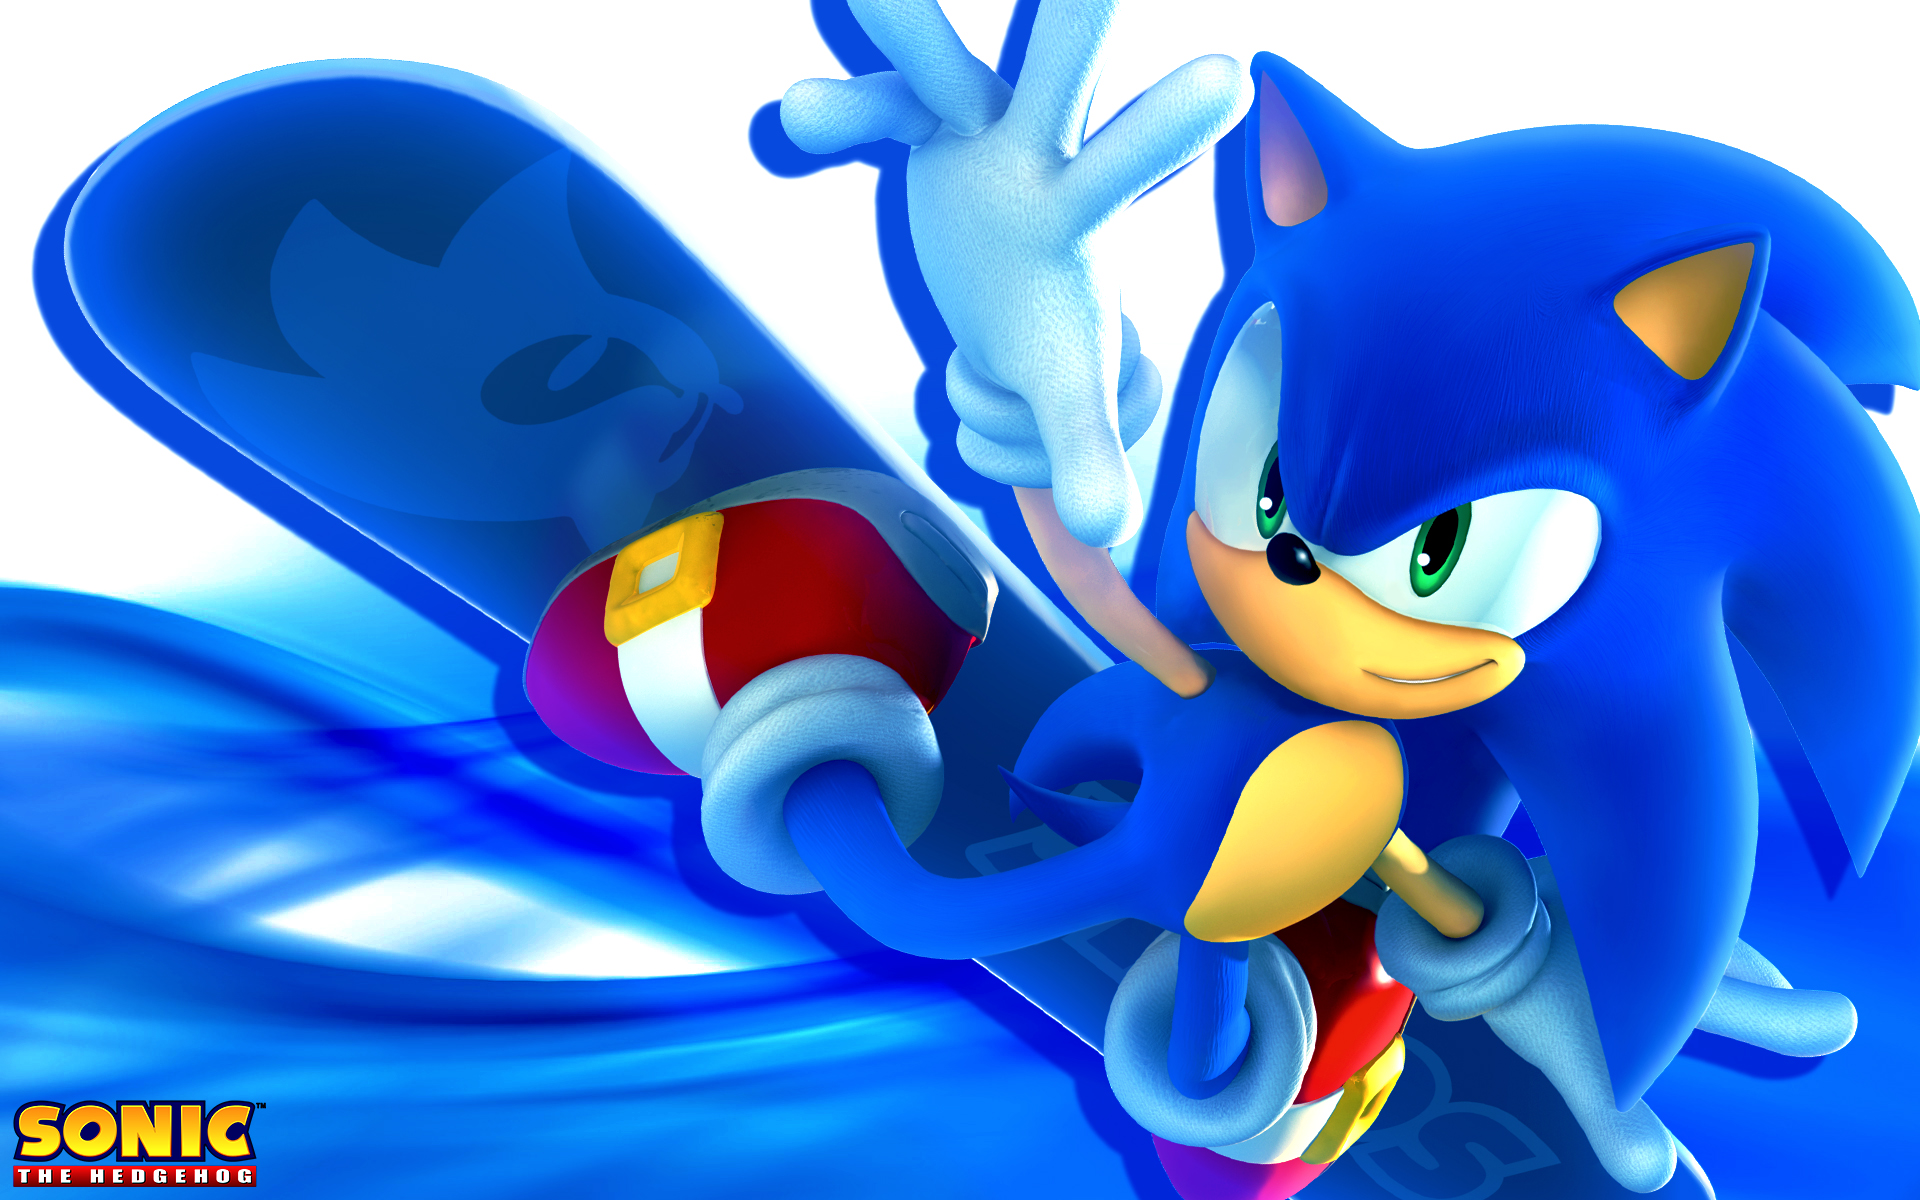 Sonic The Hedgehog Snowboarding Wallpaper by SonicTheHedgehogBG